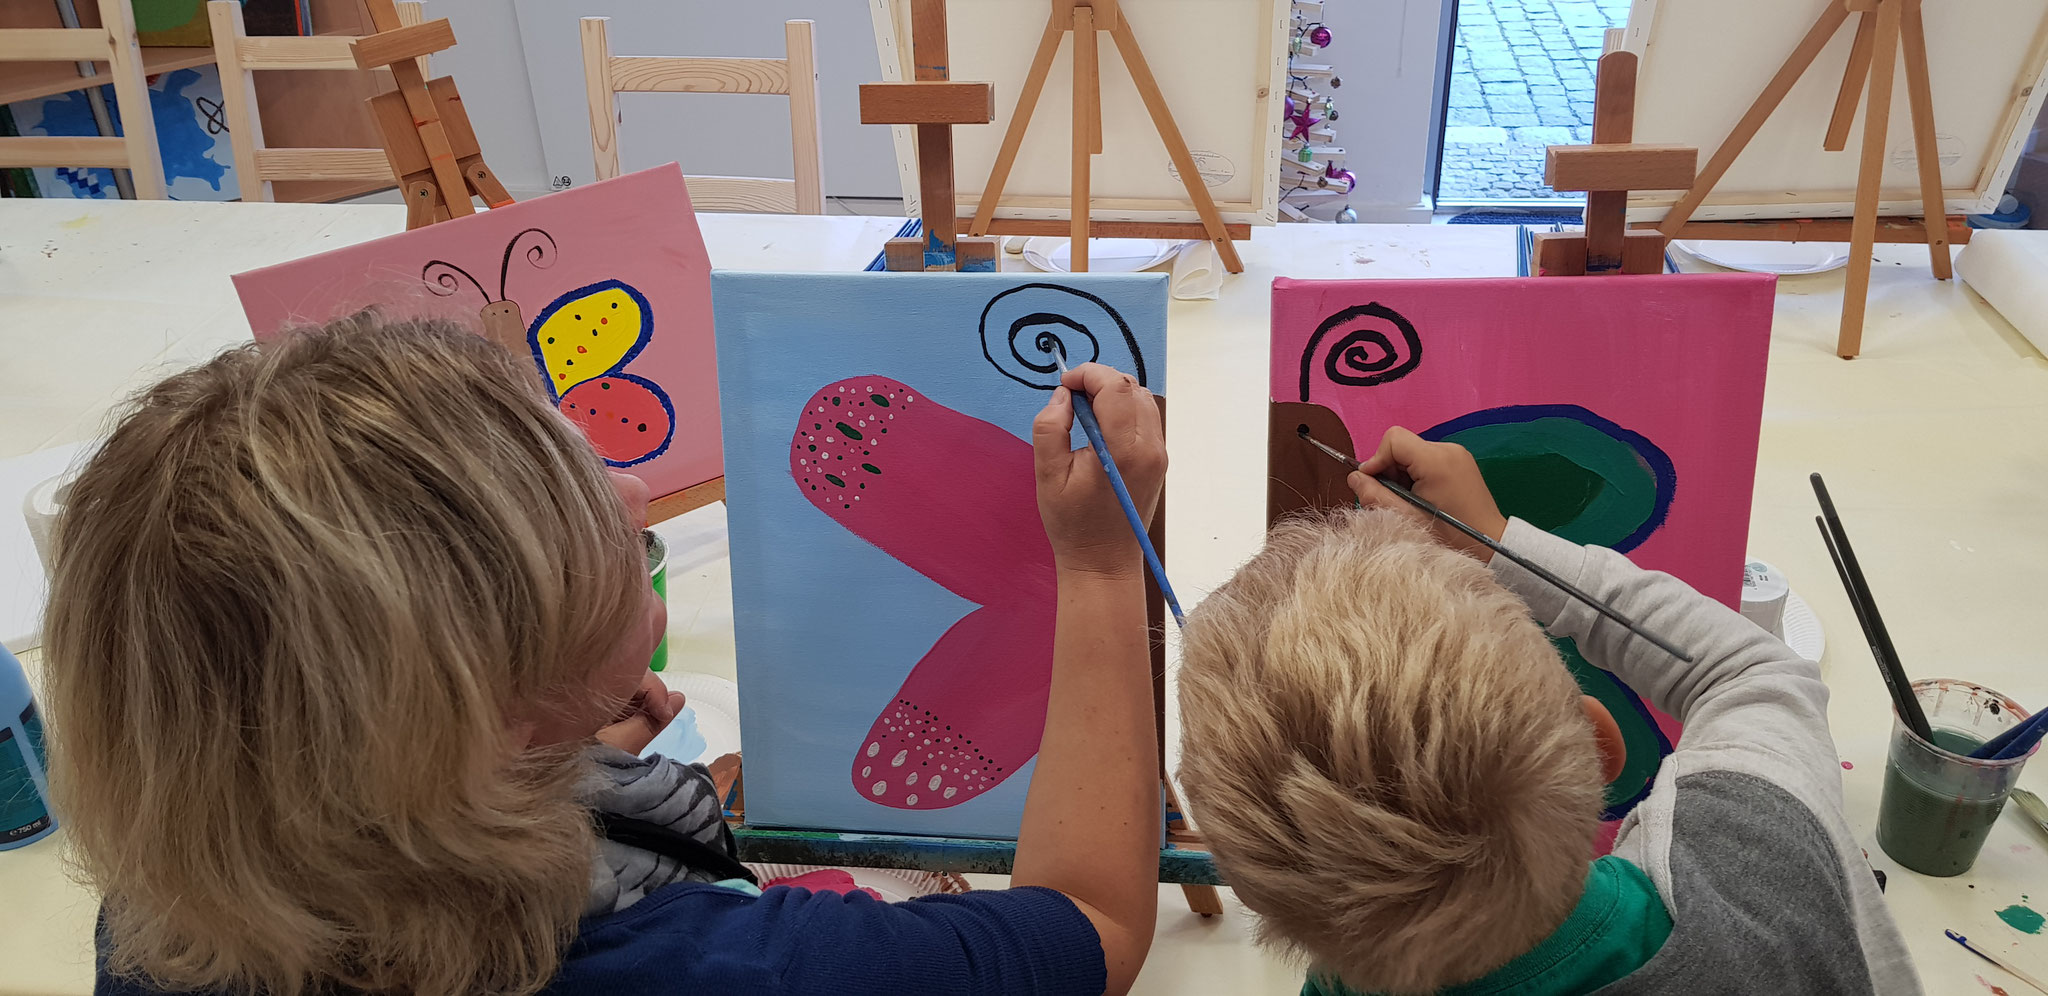 Eltern-Kind-Malen am Samstag Vormittag